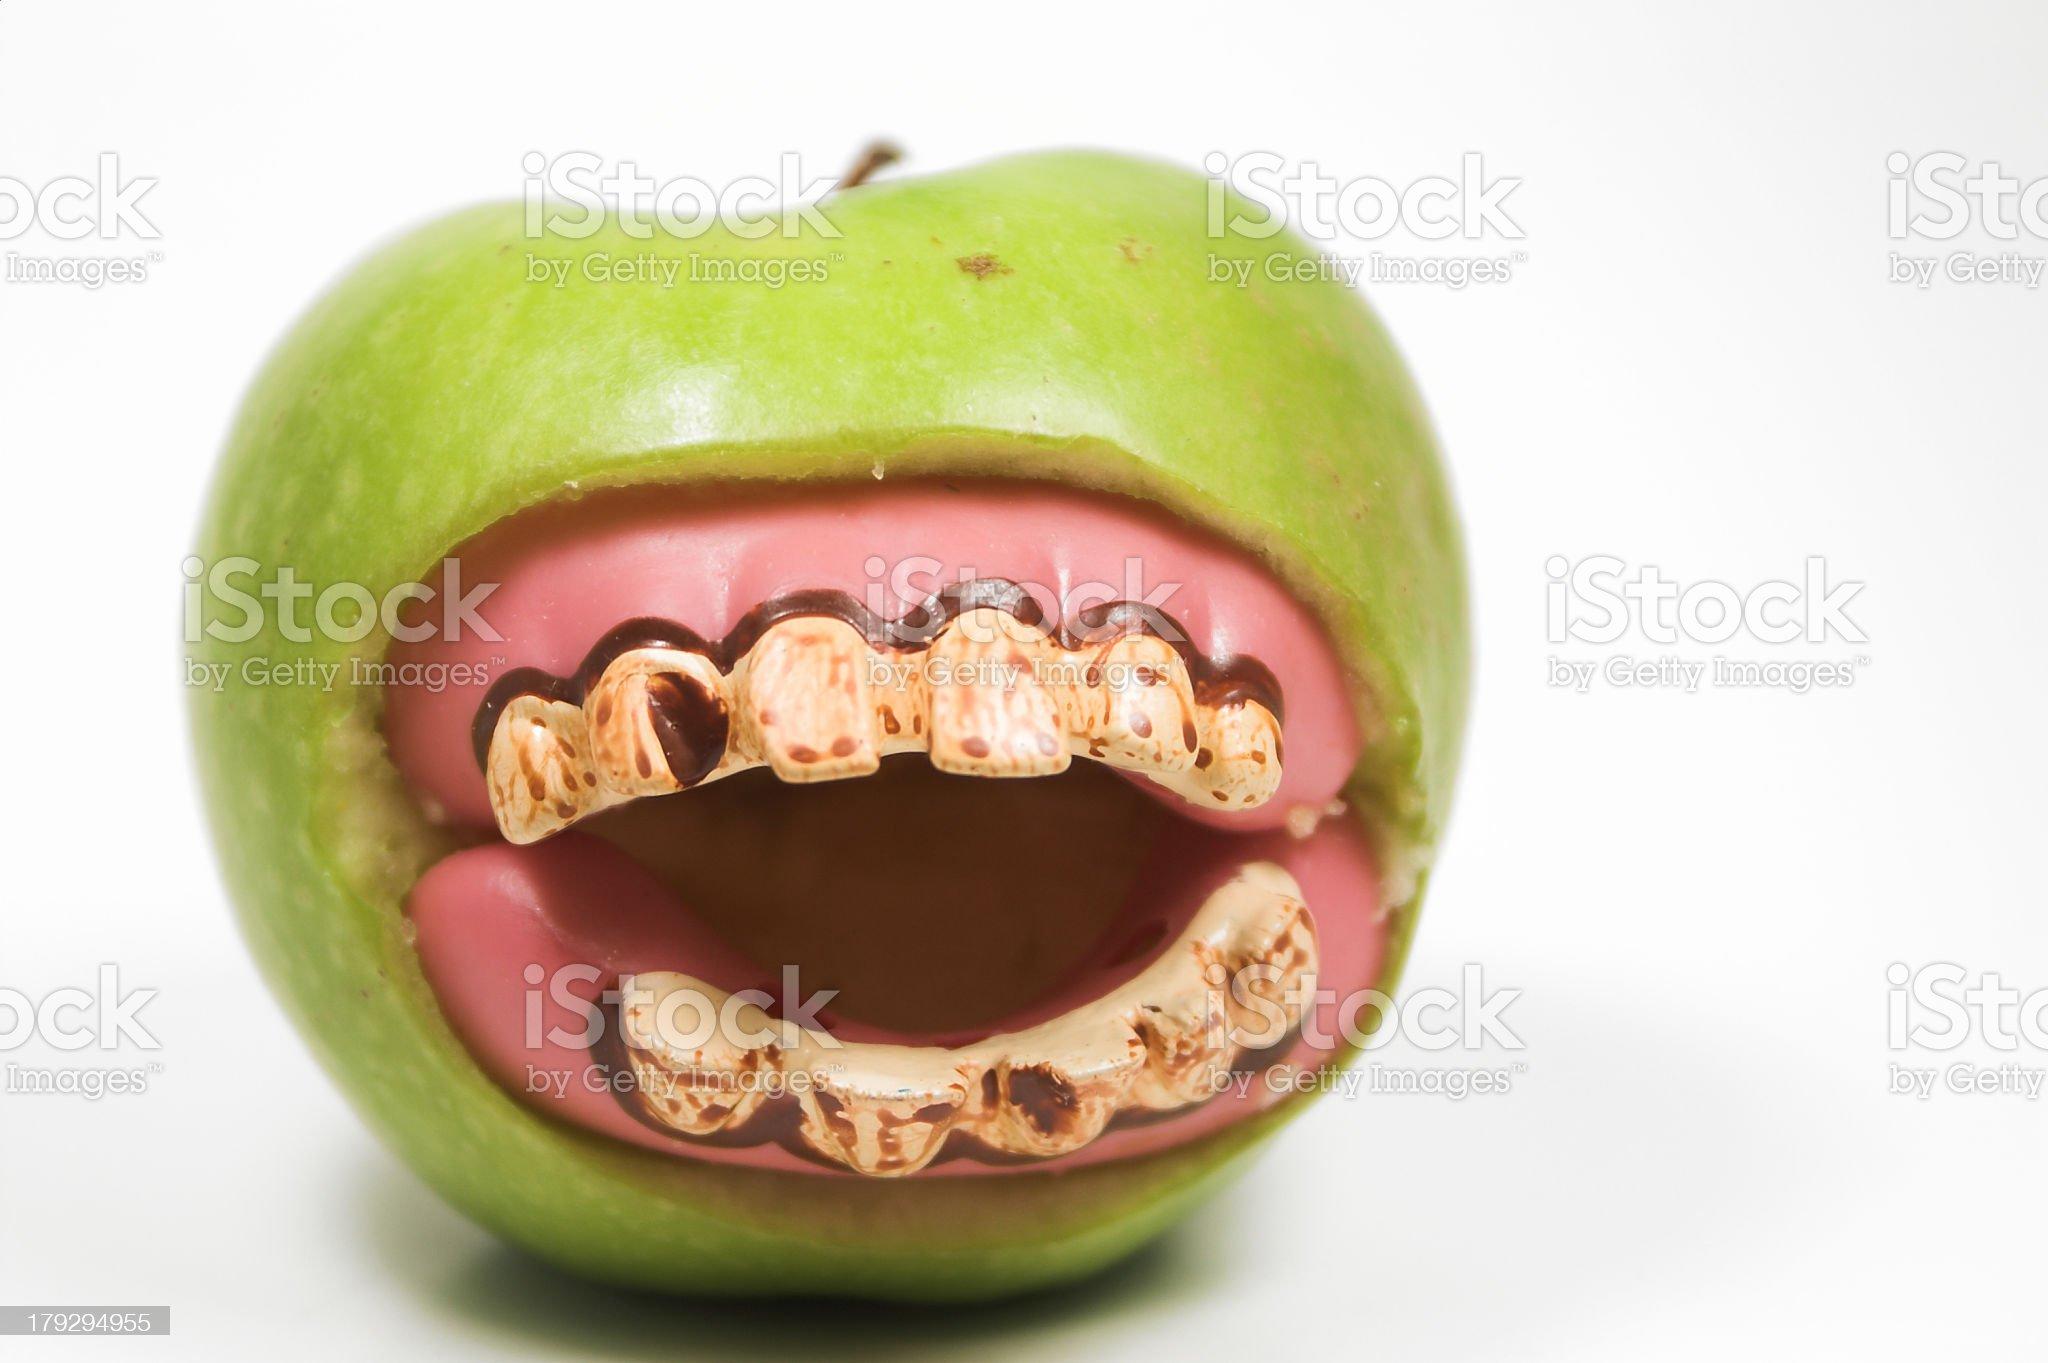 Apple Teeth royalty-free stock photo